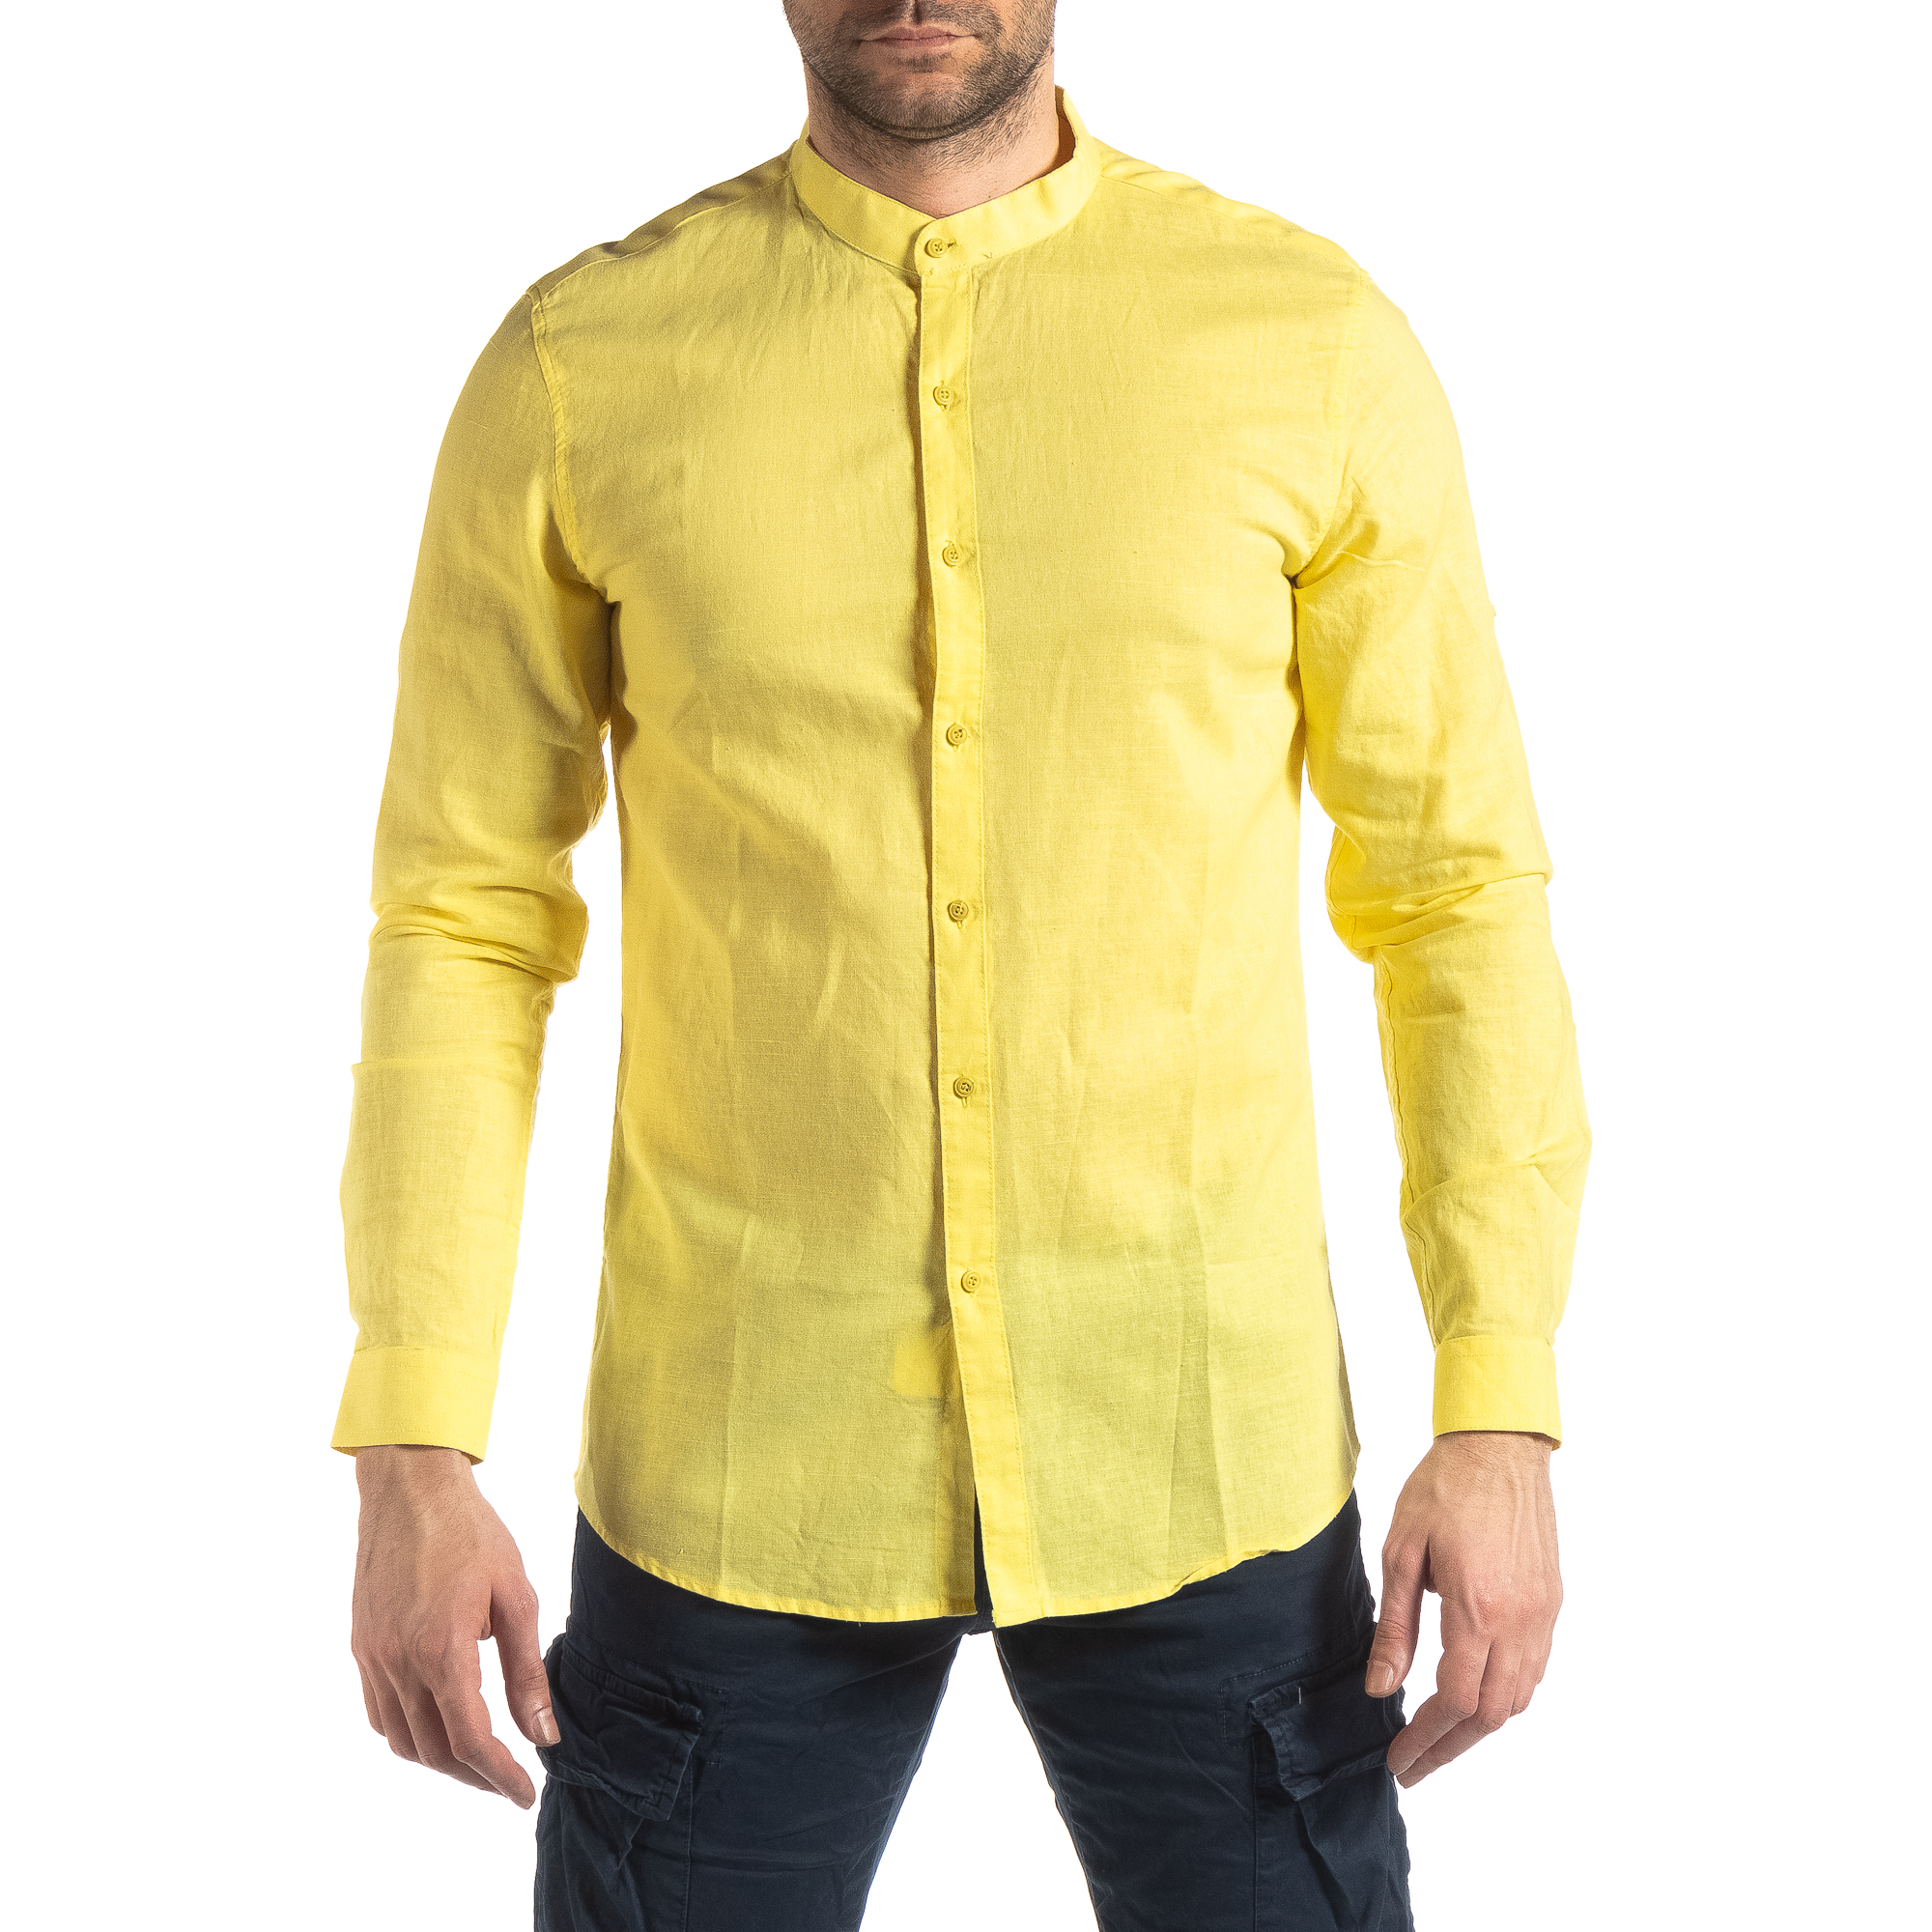 4c738d888765 Ανδρικό κίτρινο πουκάμισο από λινό και βαμβάκι